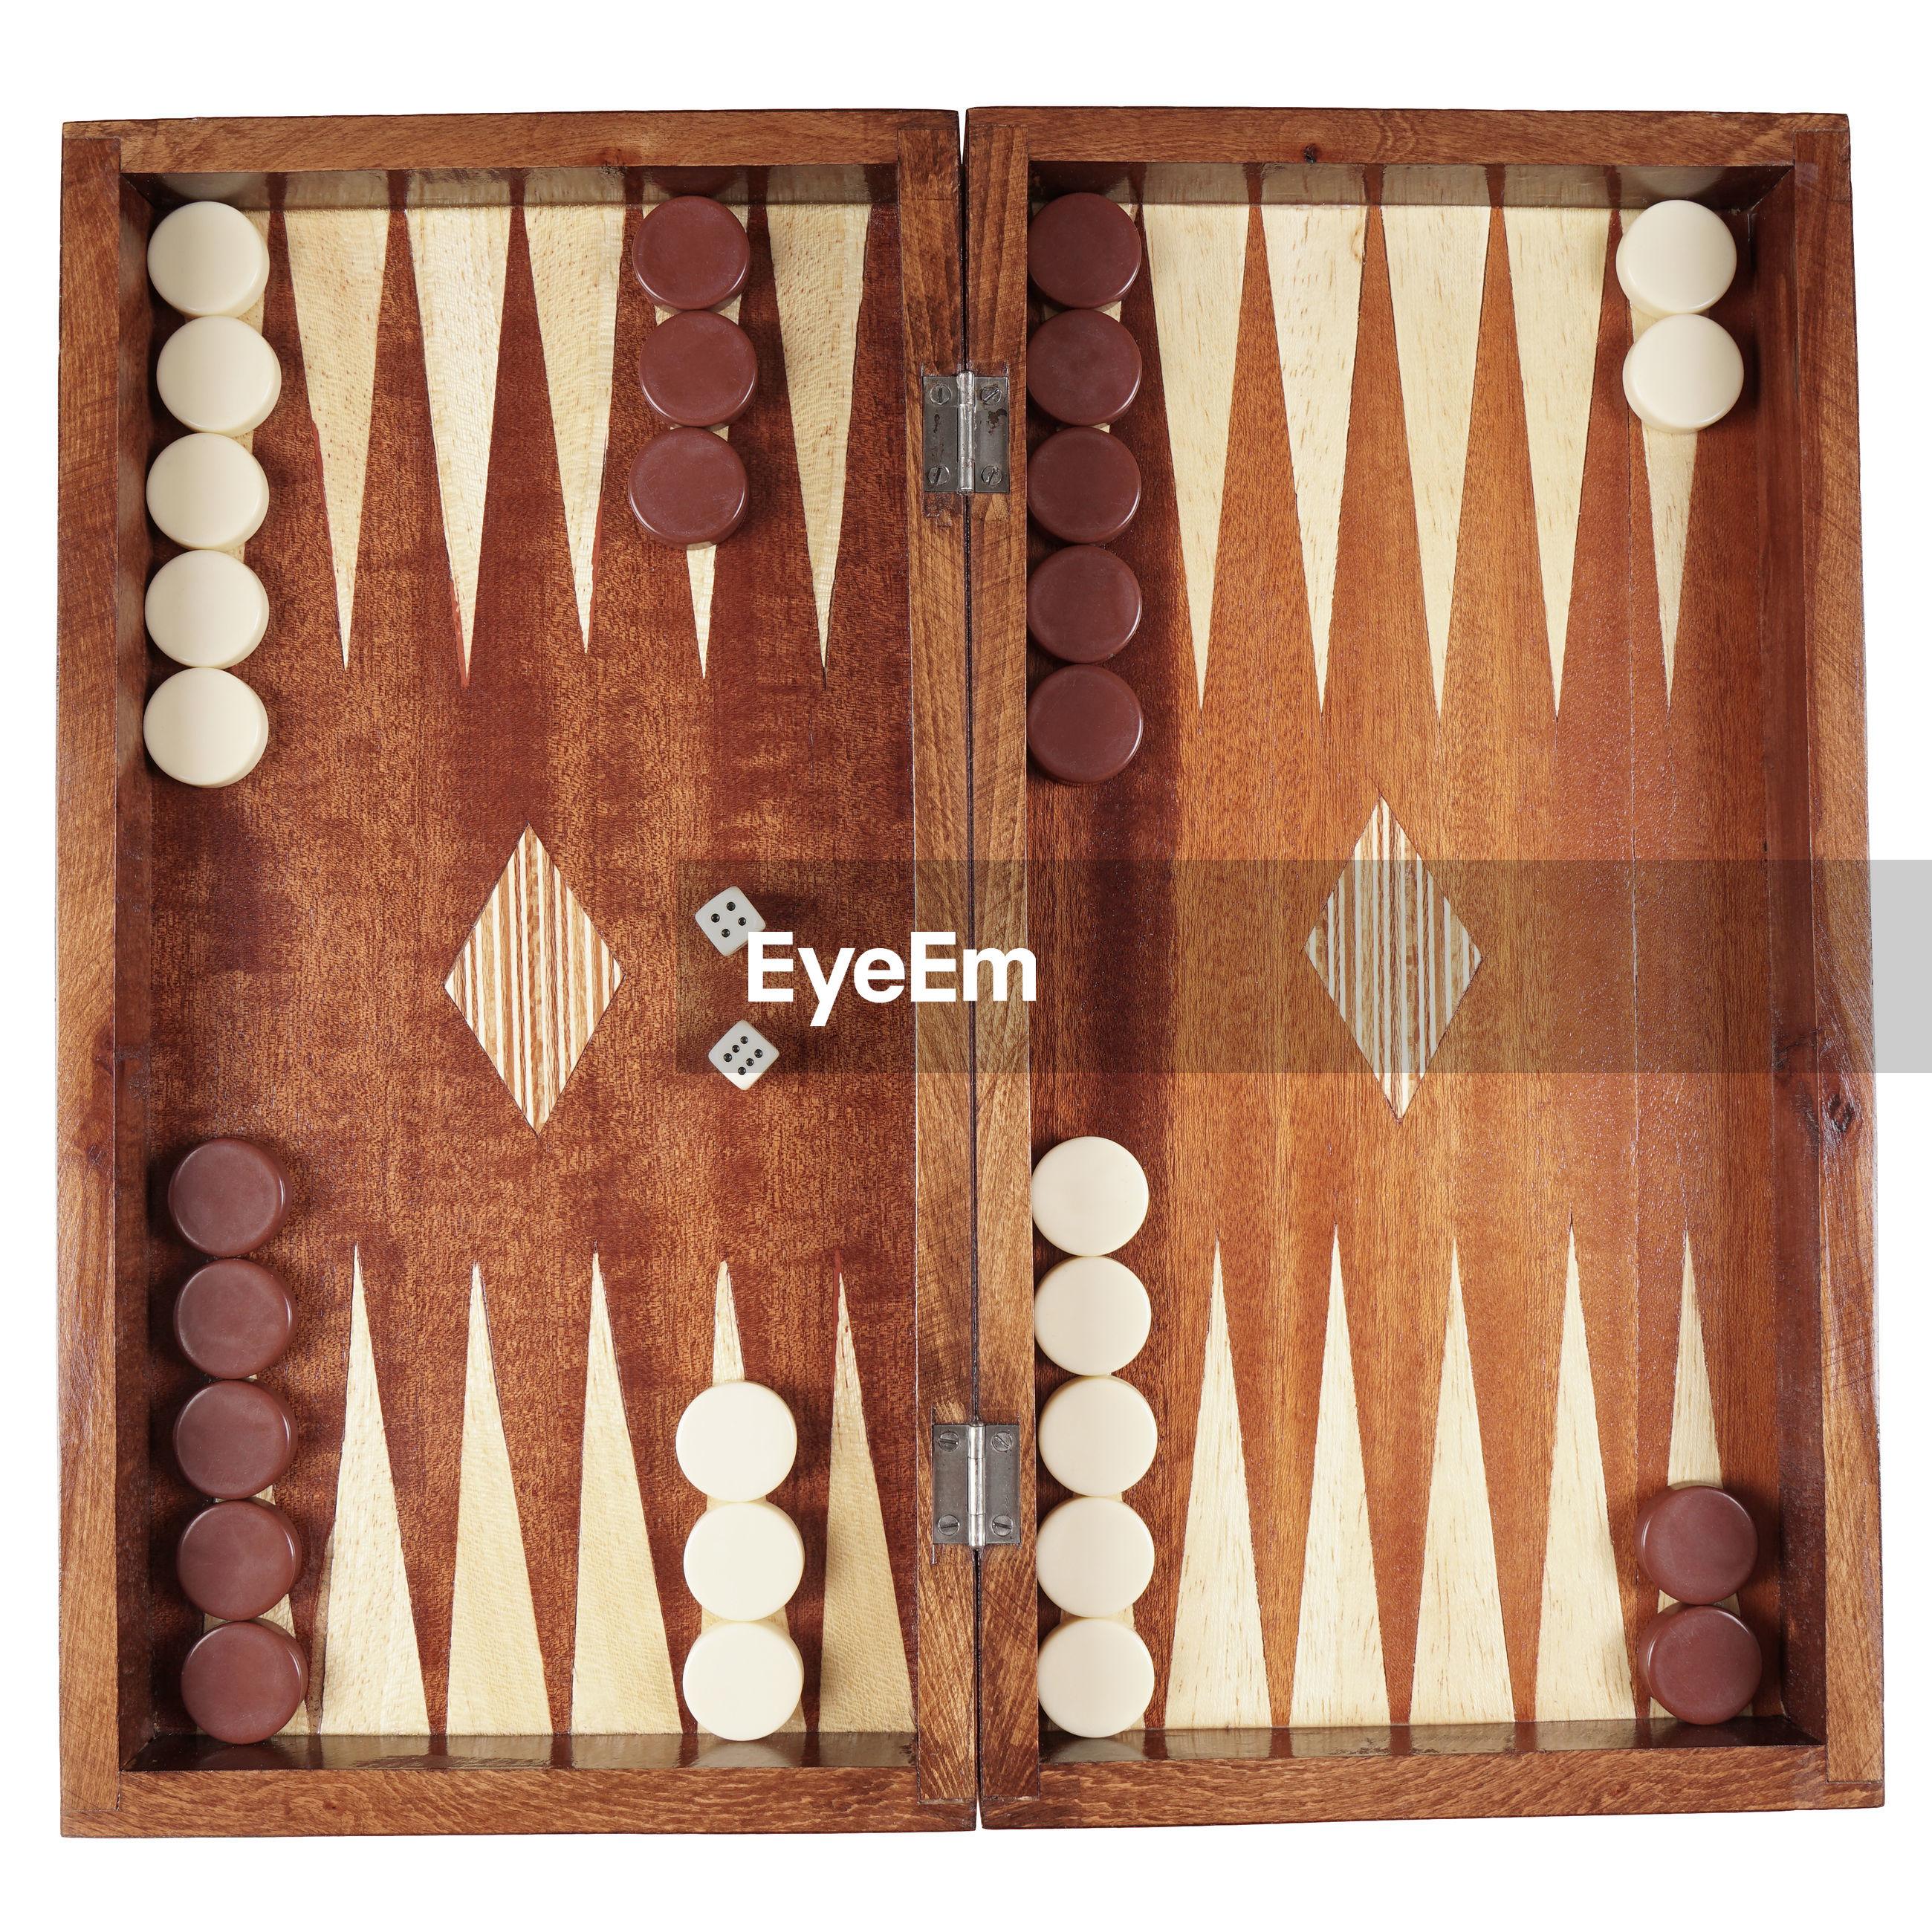 Directly above shot of backgammon against white background